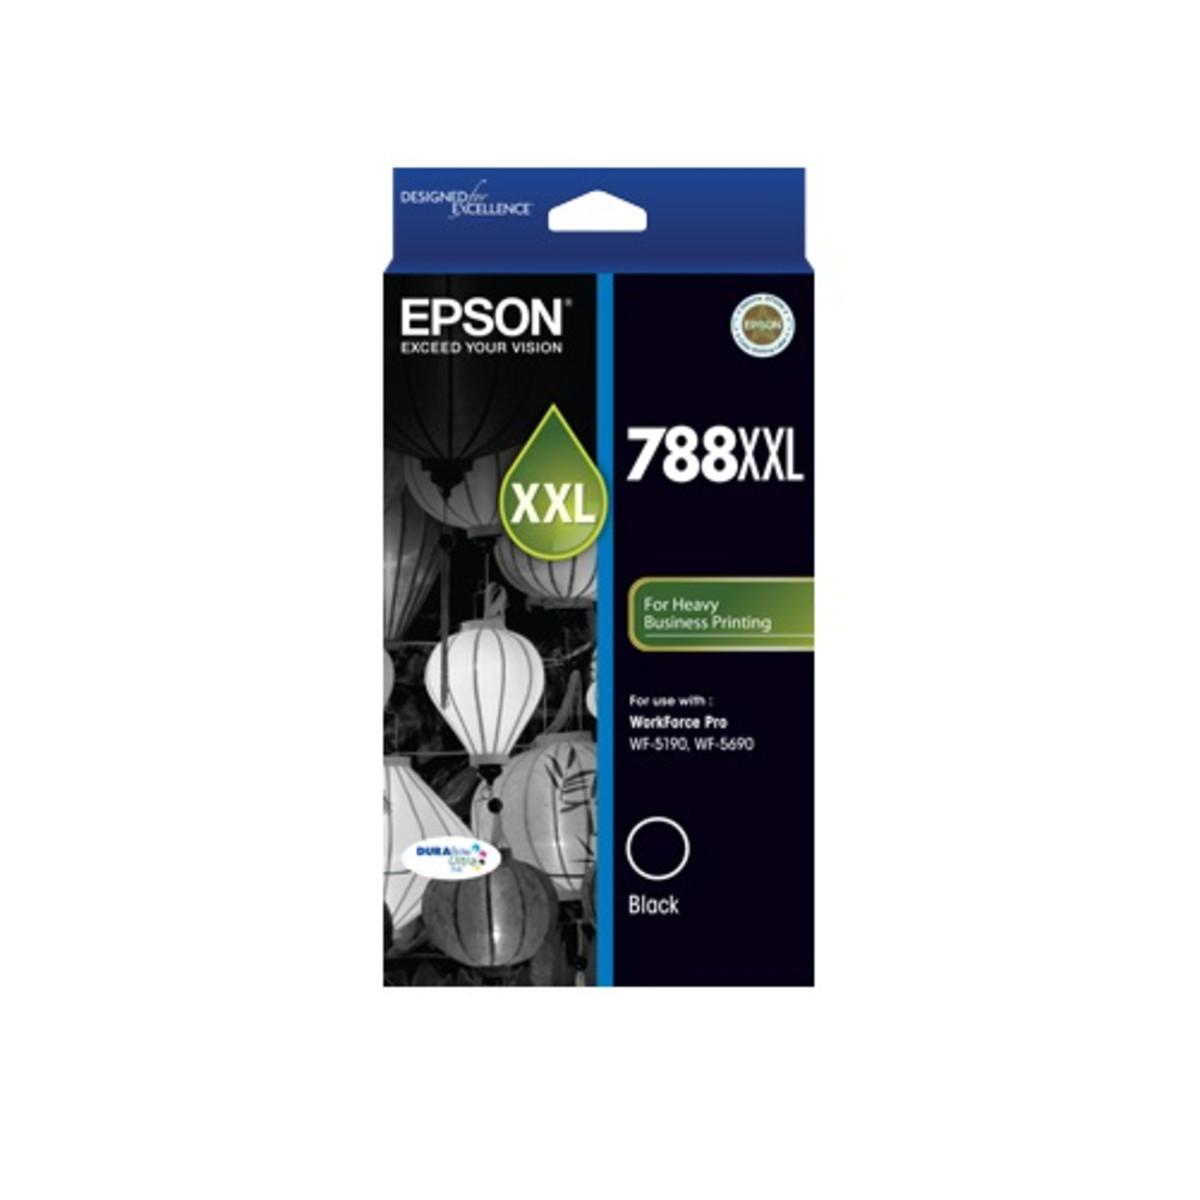 Epson 788XXL Black Inkjet Cartridge - High Yield